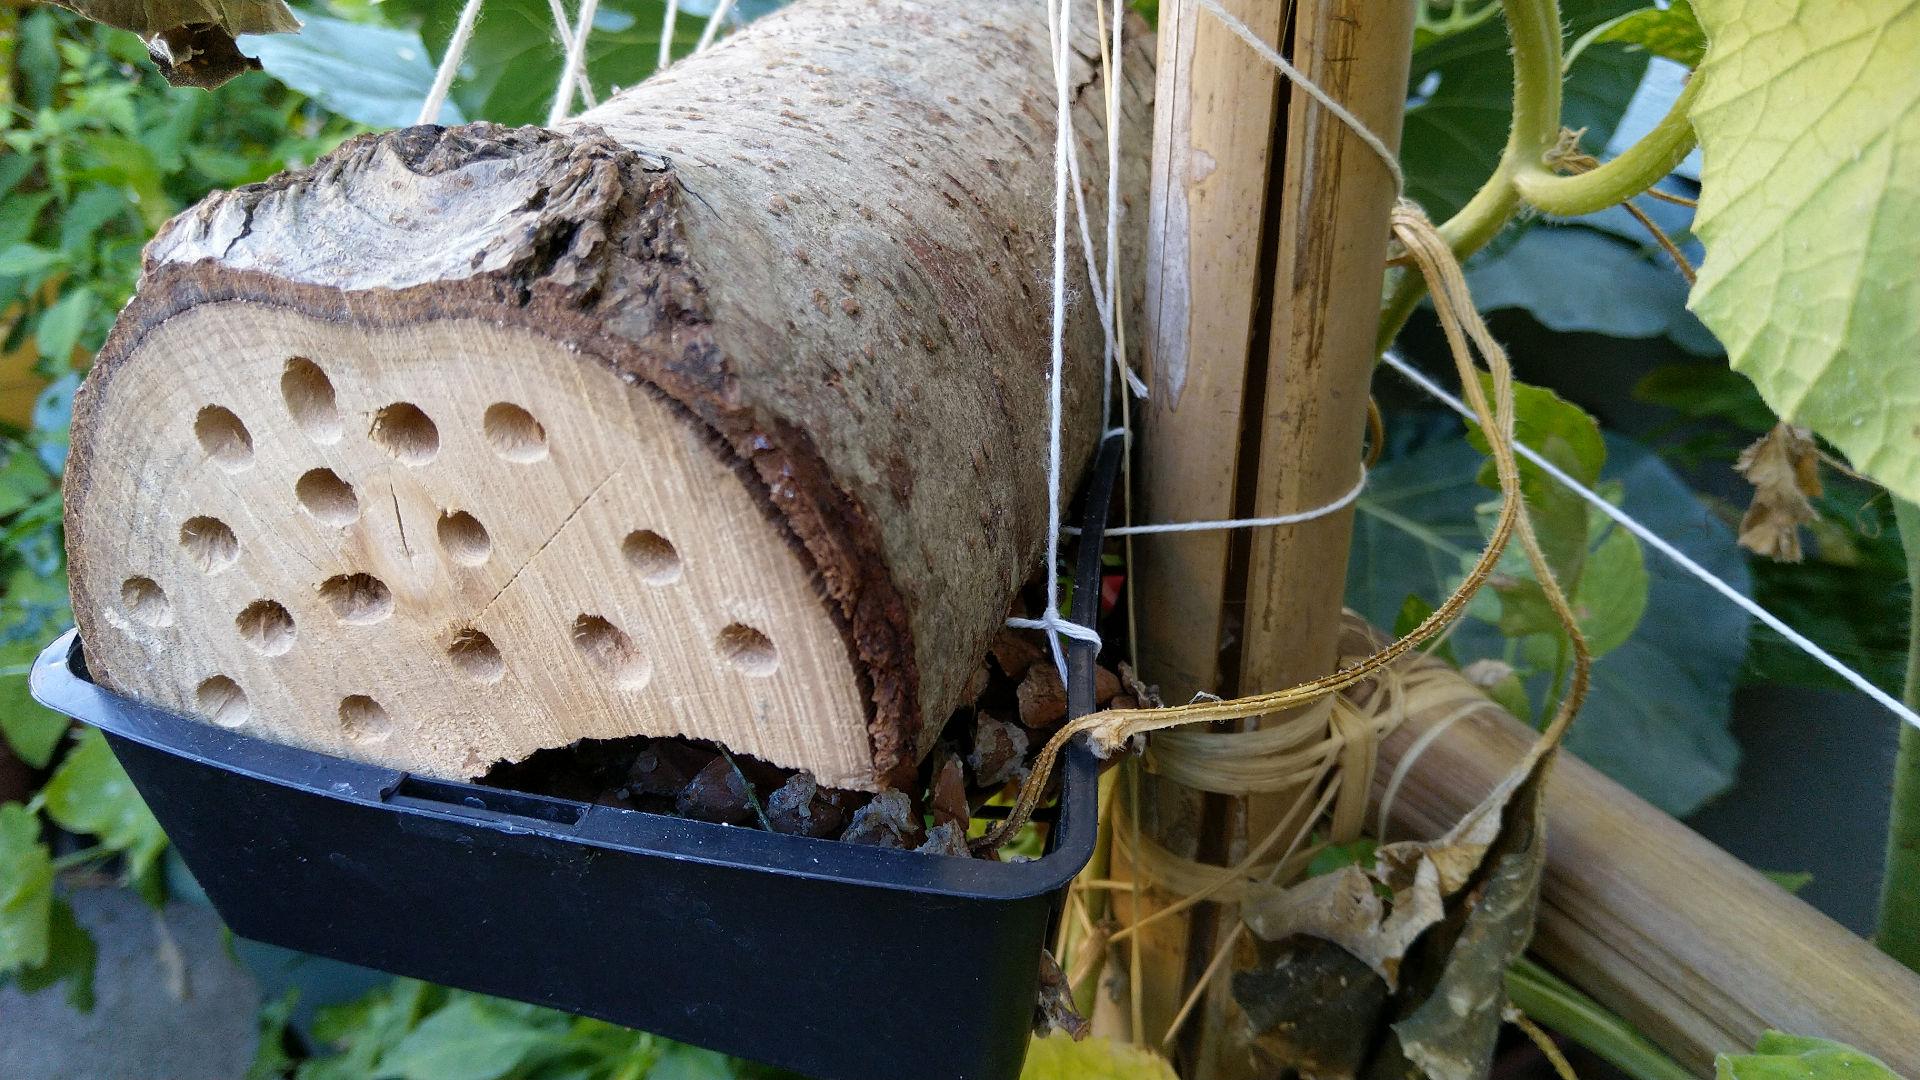 buche-hotel-insectes-abeille-potager-urbain